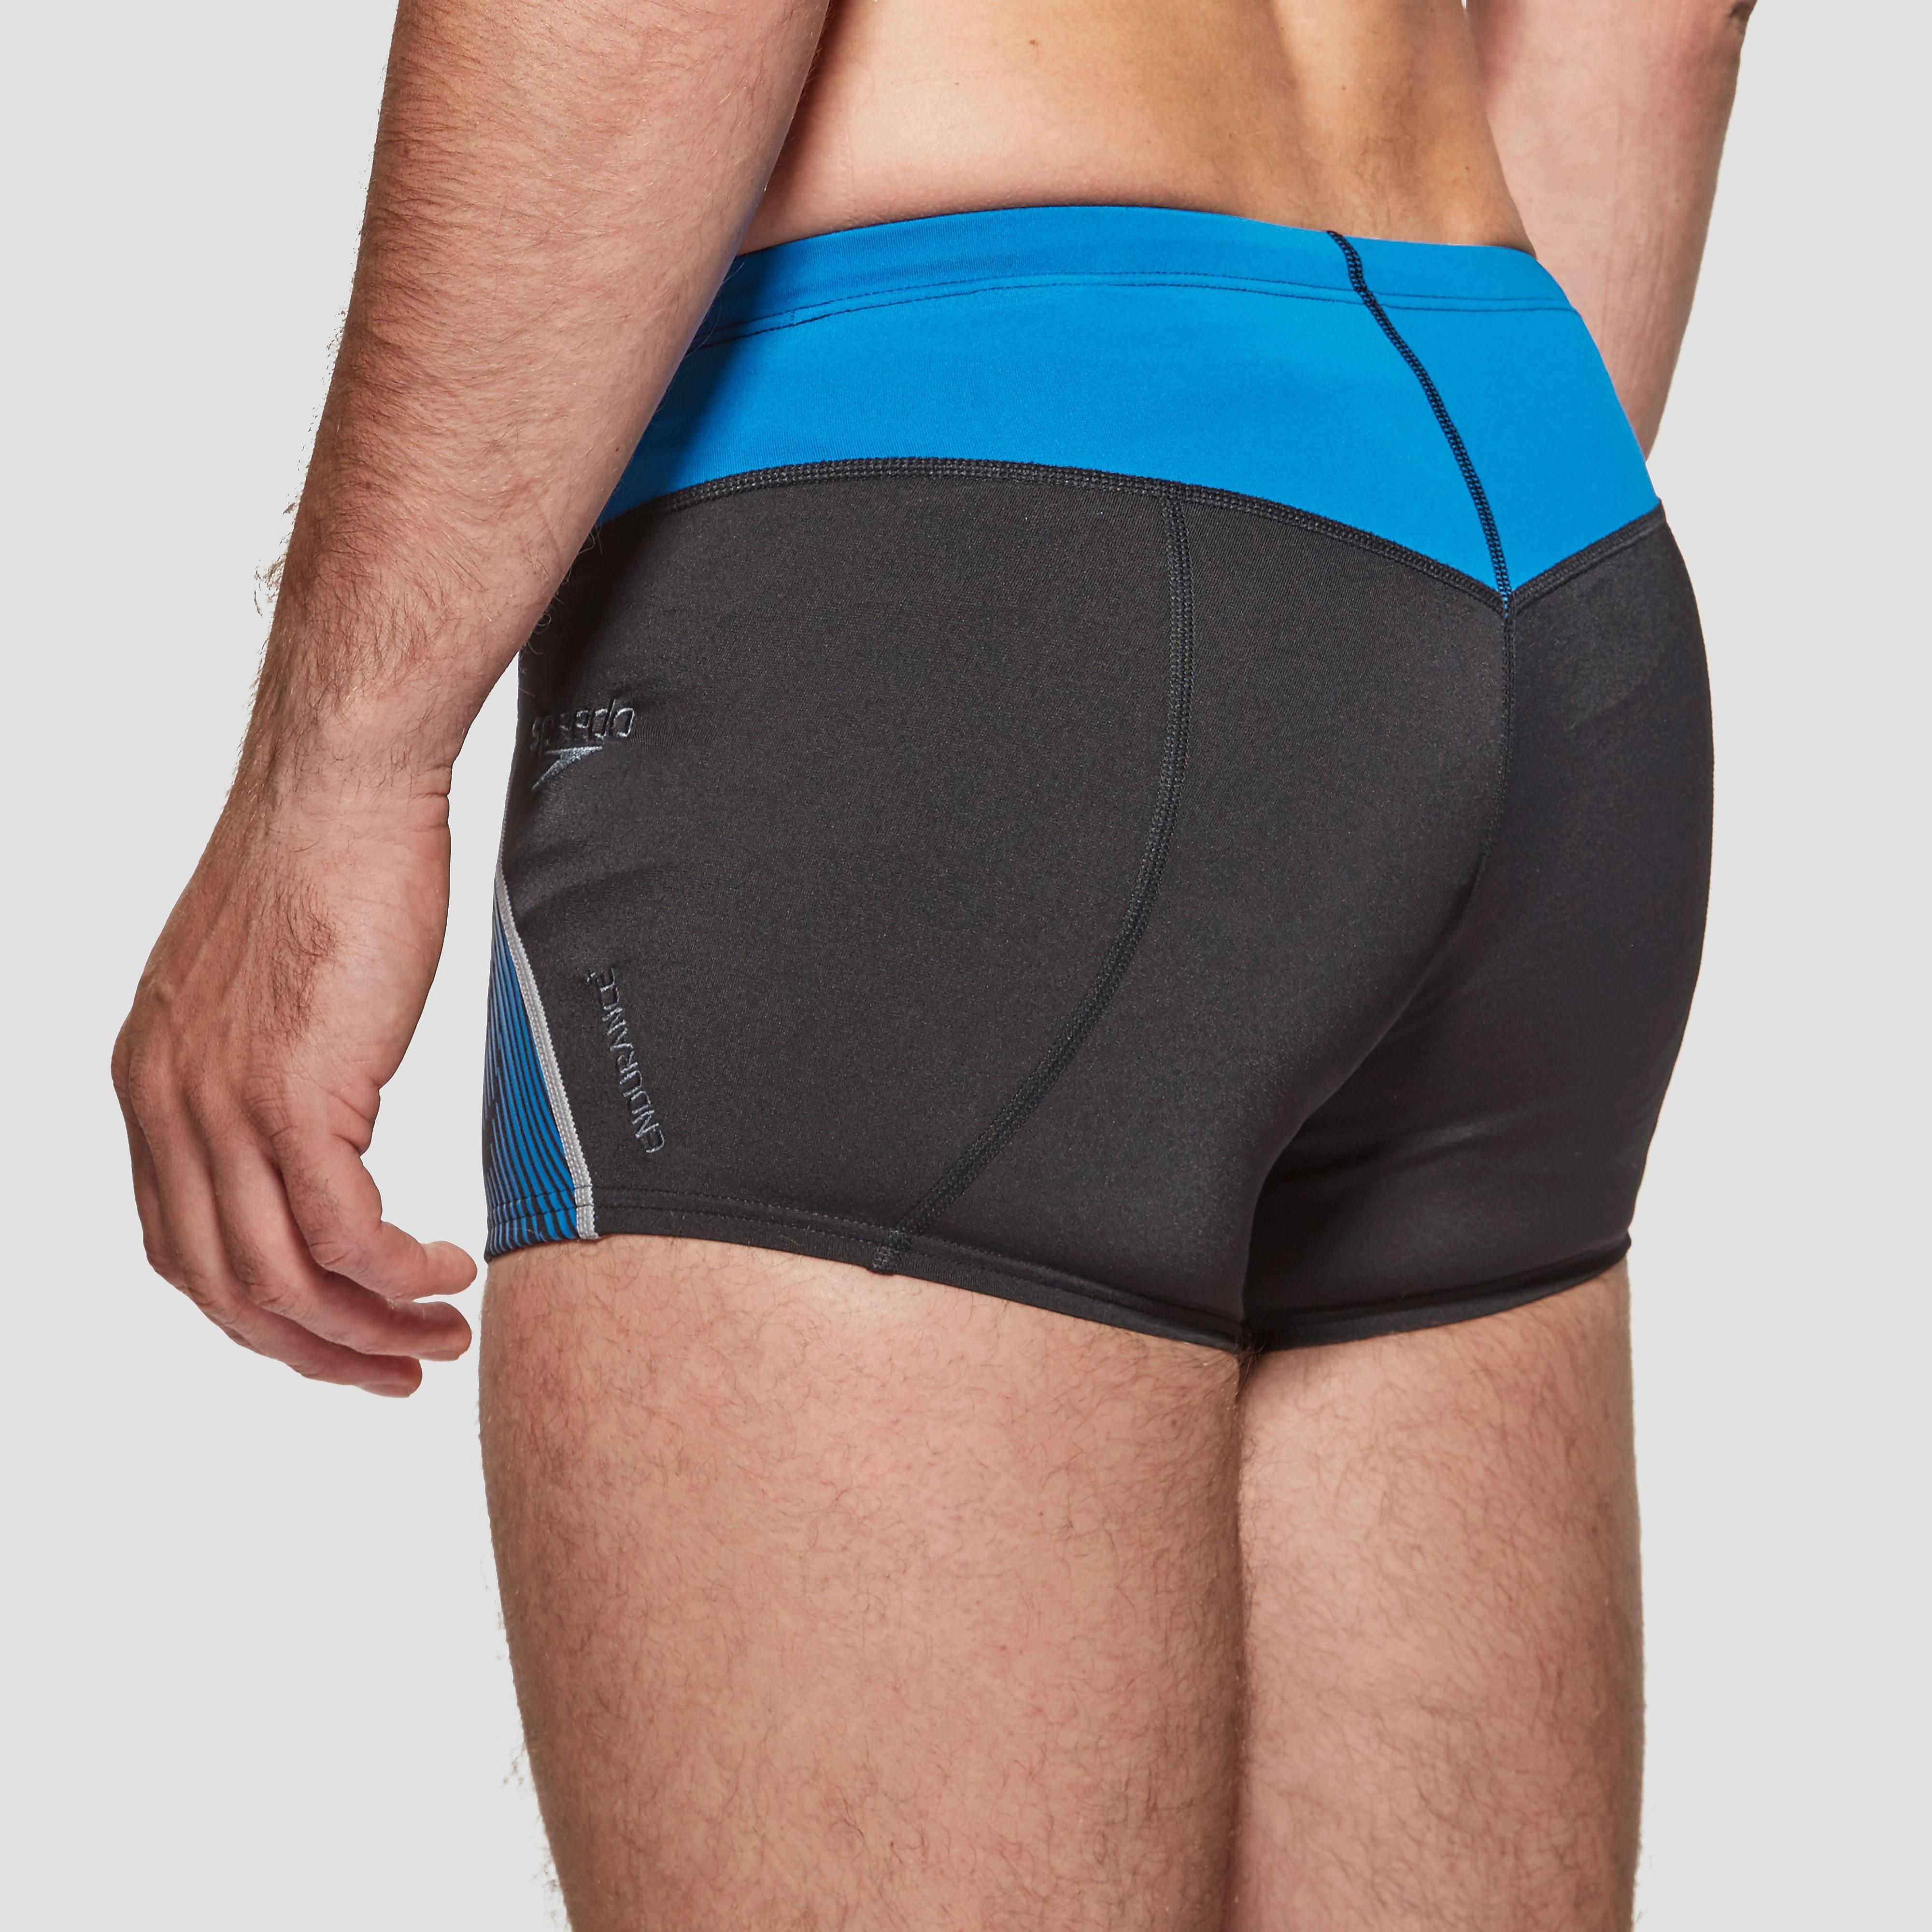 Speedo Speedo Fit Panel Men's Aqua Shorts